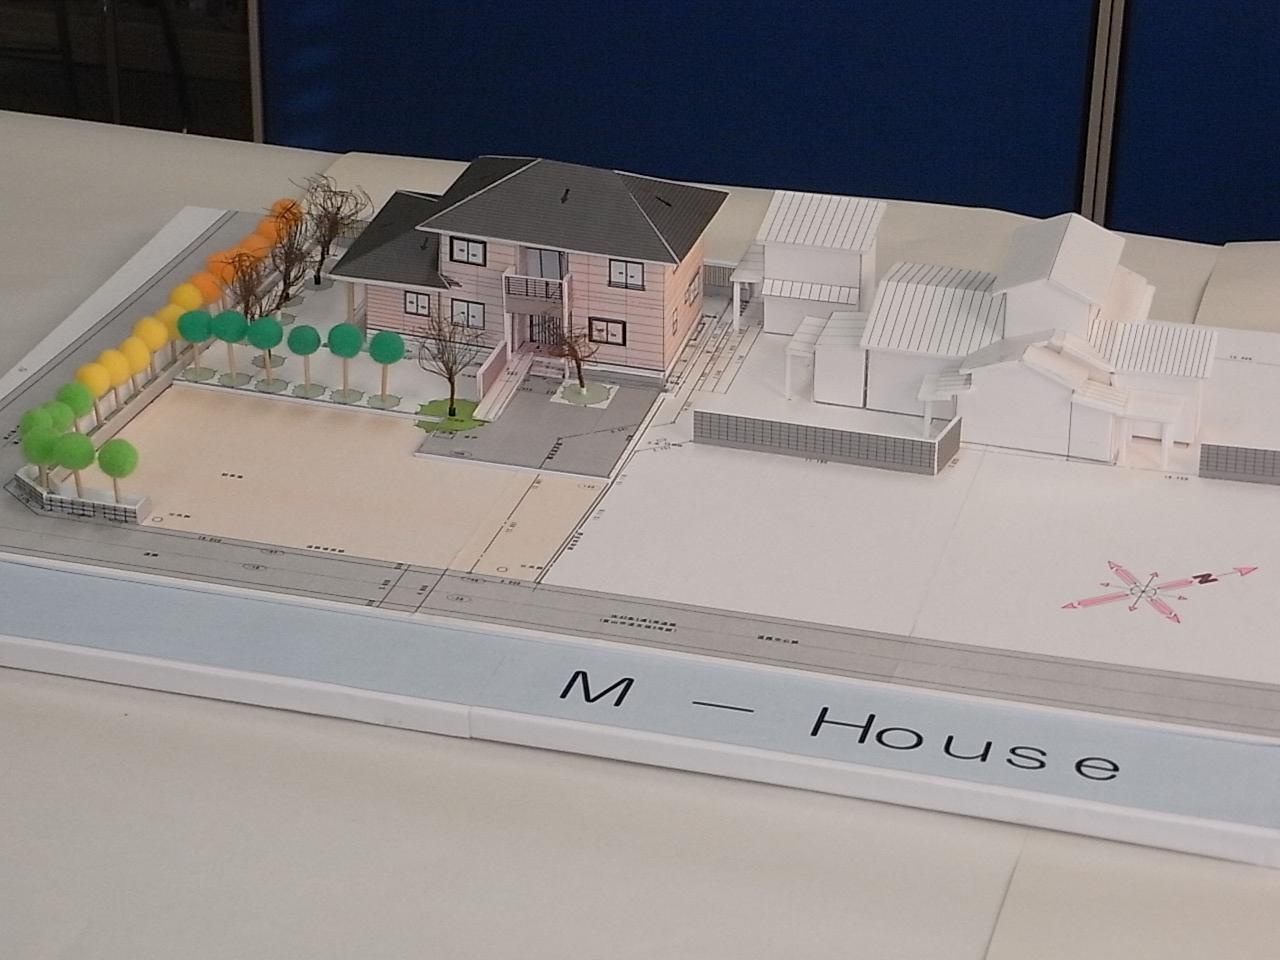 m-house模型_c0194417_1151576.jpg